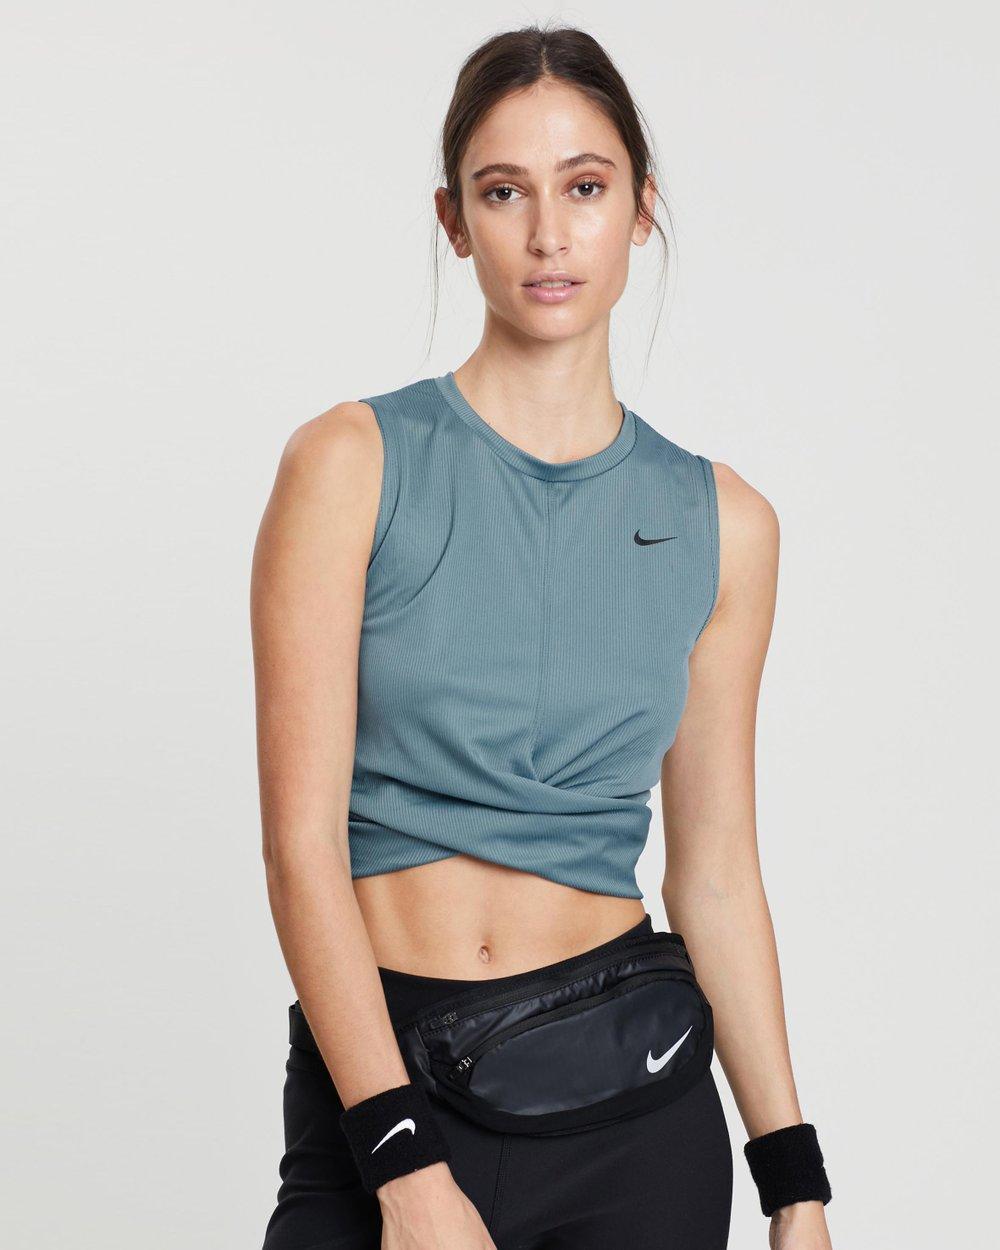 b1891b7d513899 Dry-Fit Twist Crop Tank by Nike Online